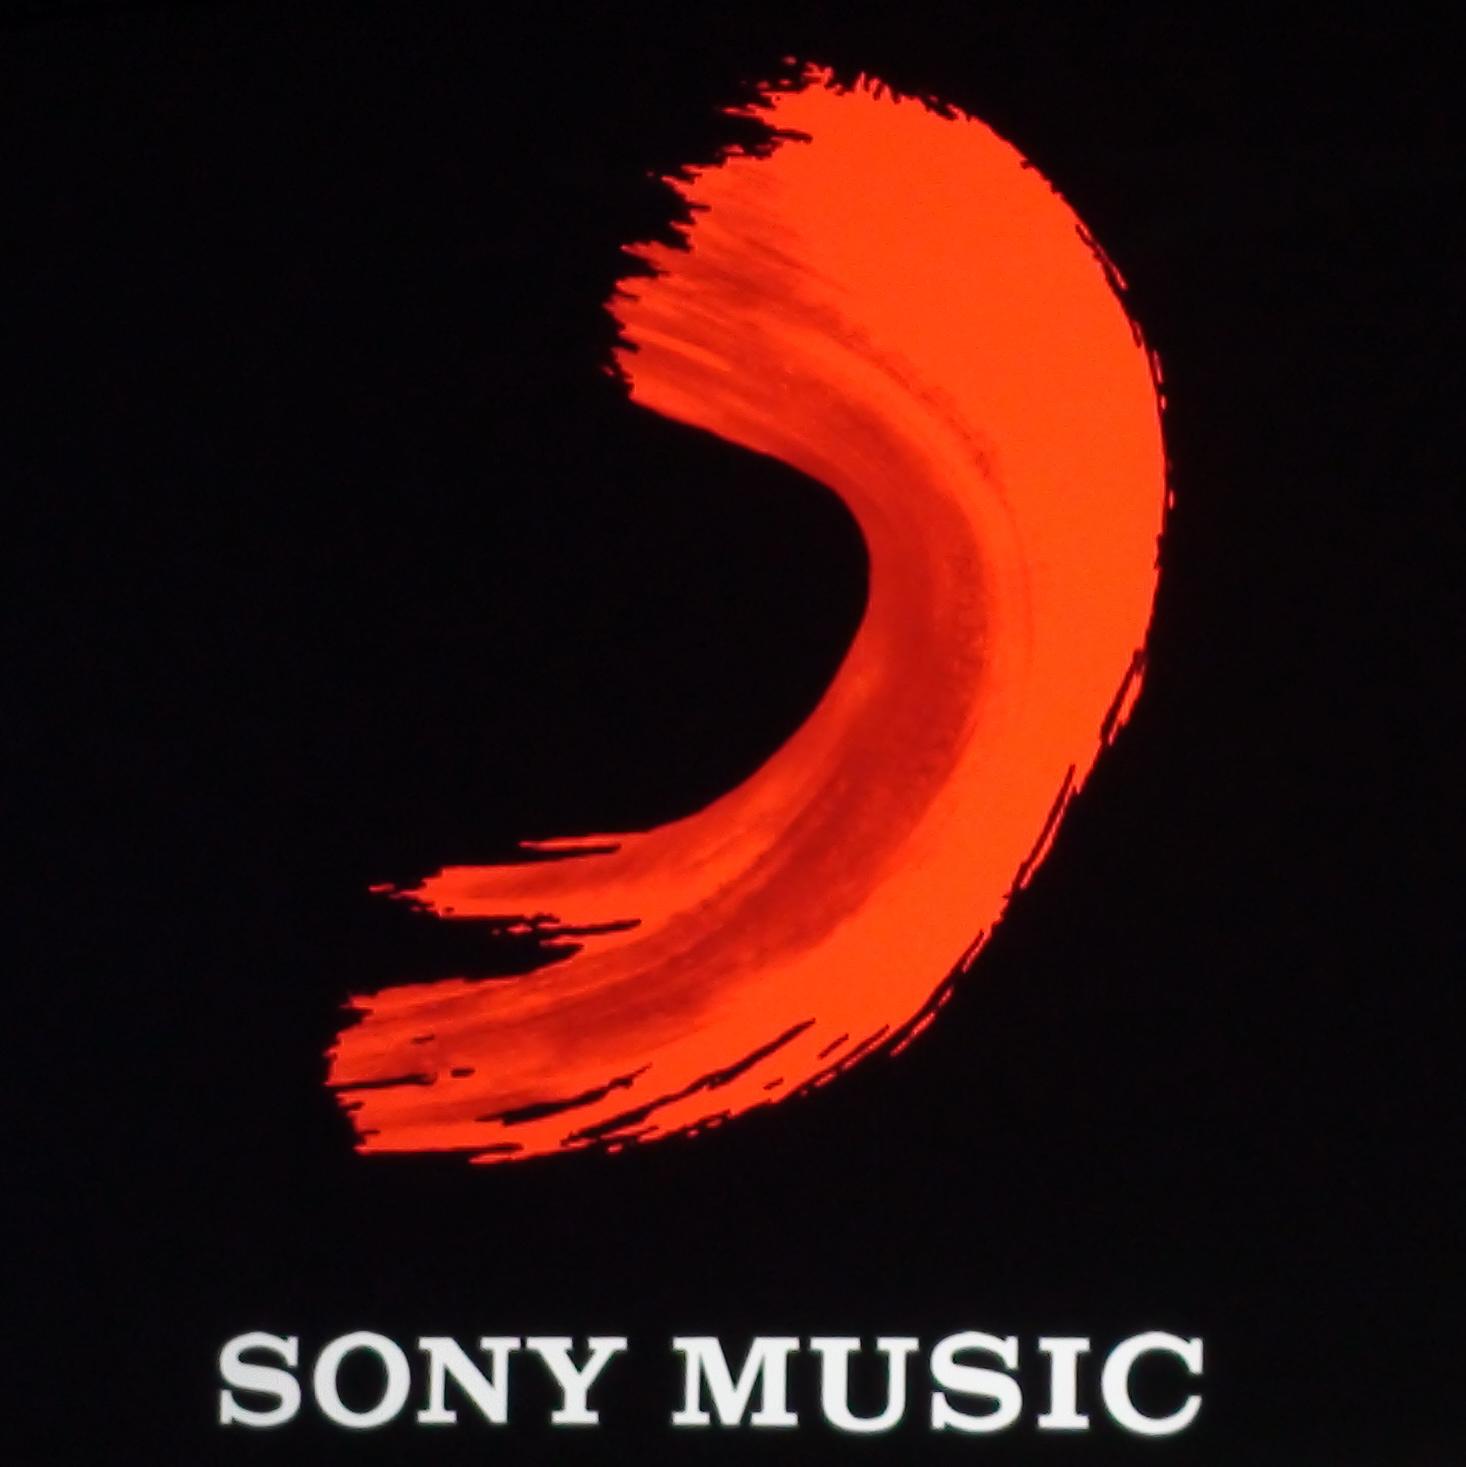 sony music.jpg